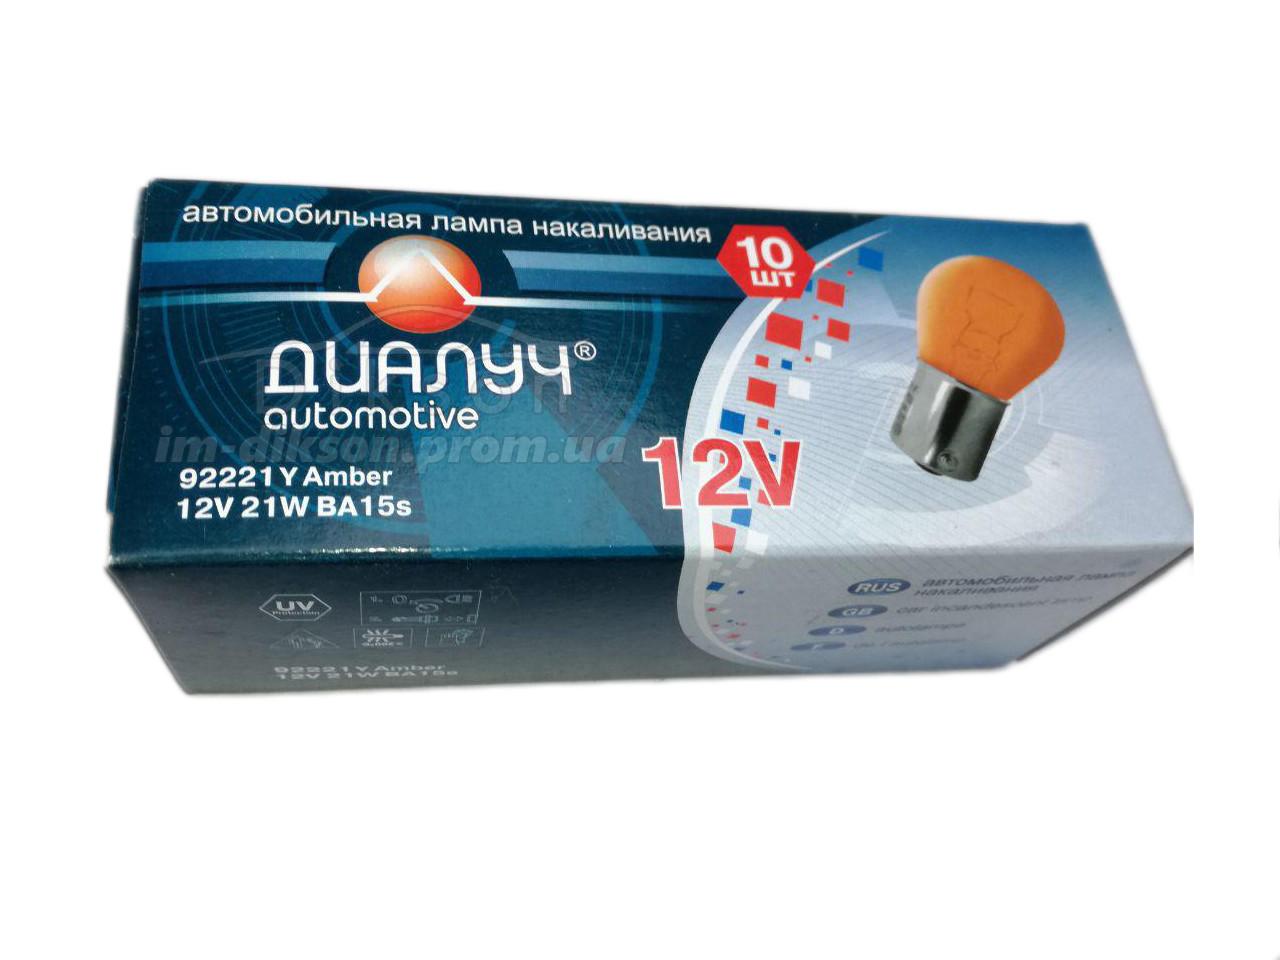 Лампочка Диалуч 12V 21W BA15S P21W Amber